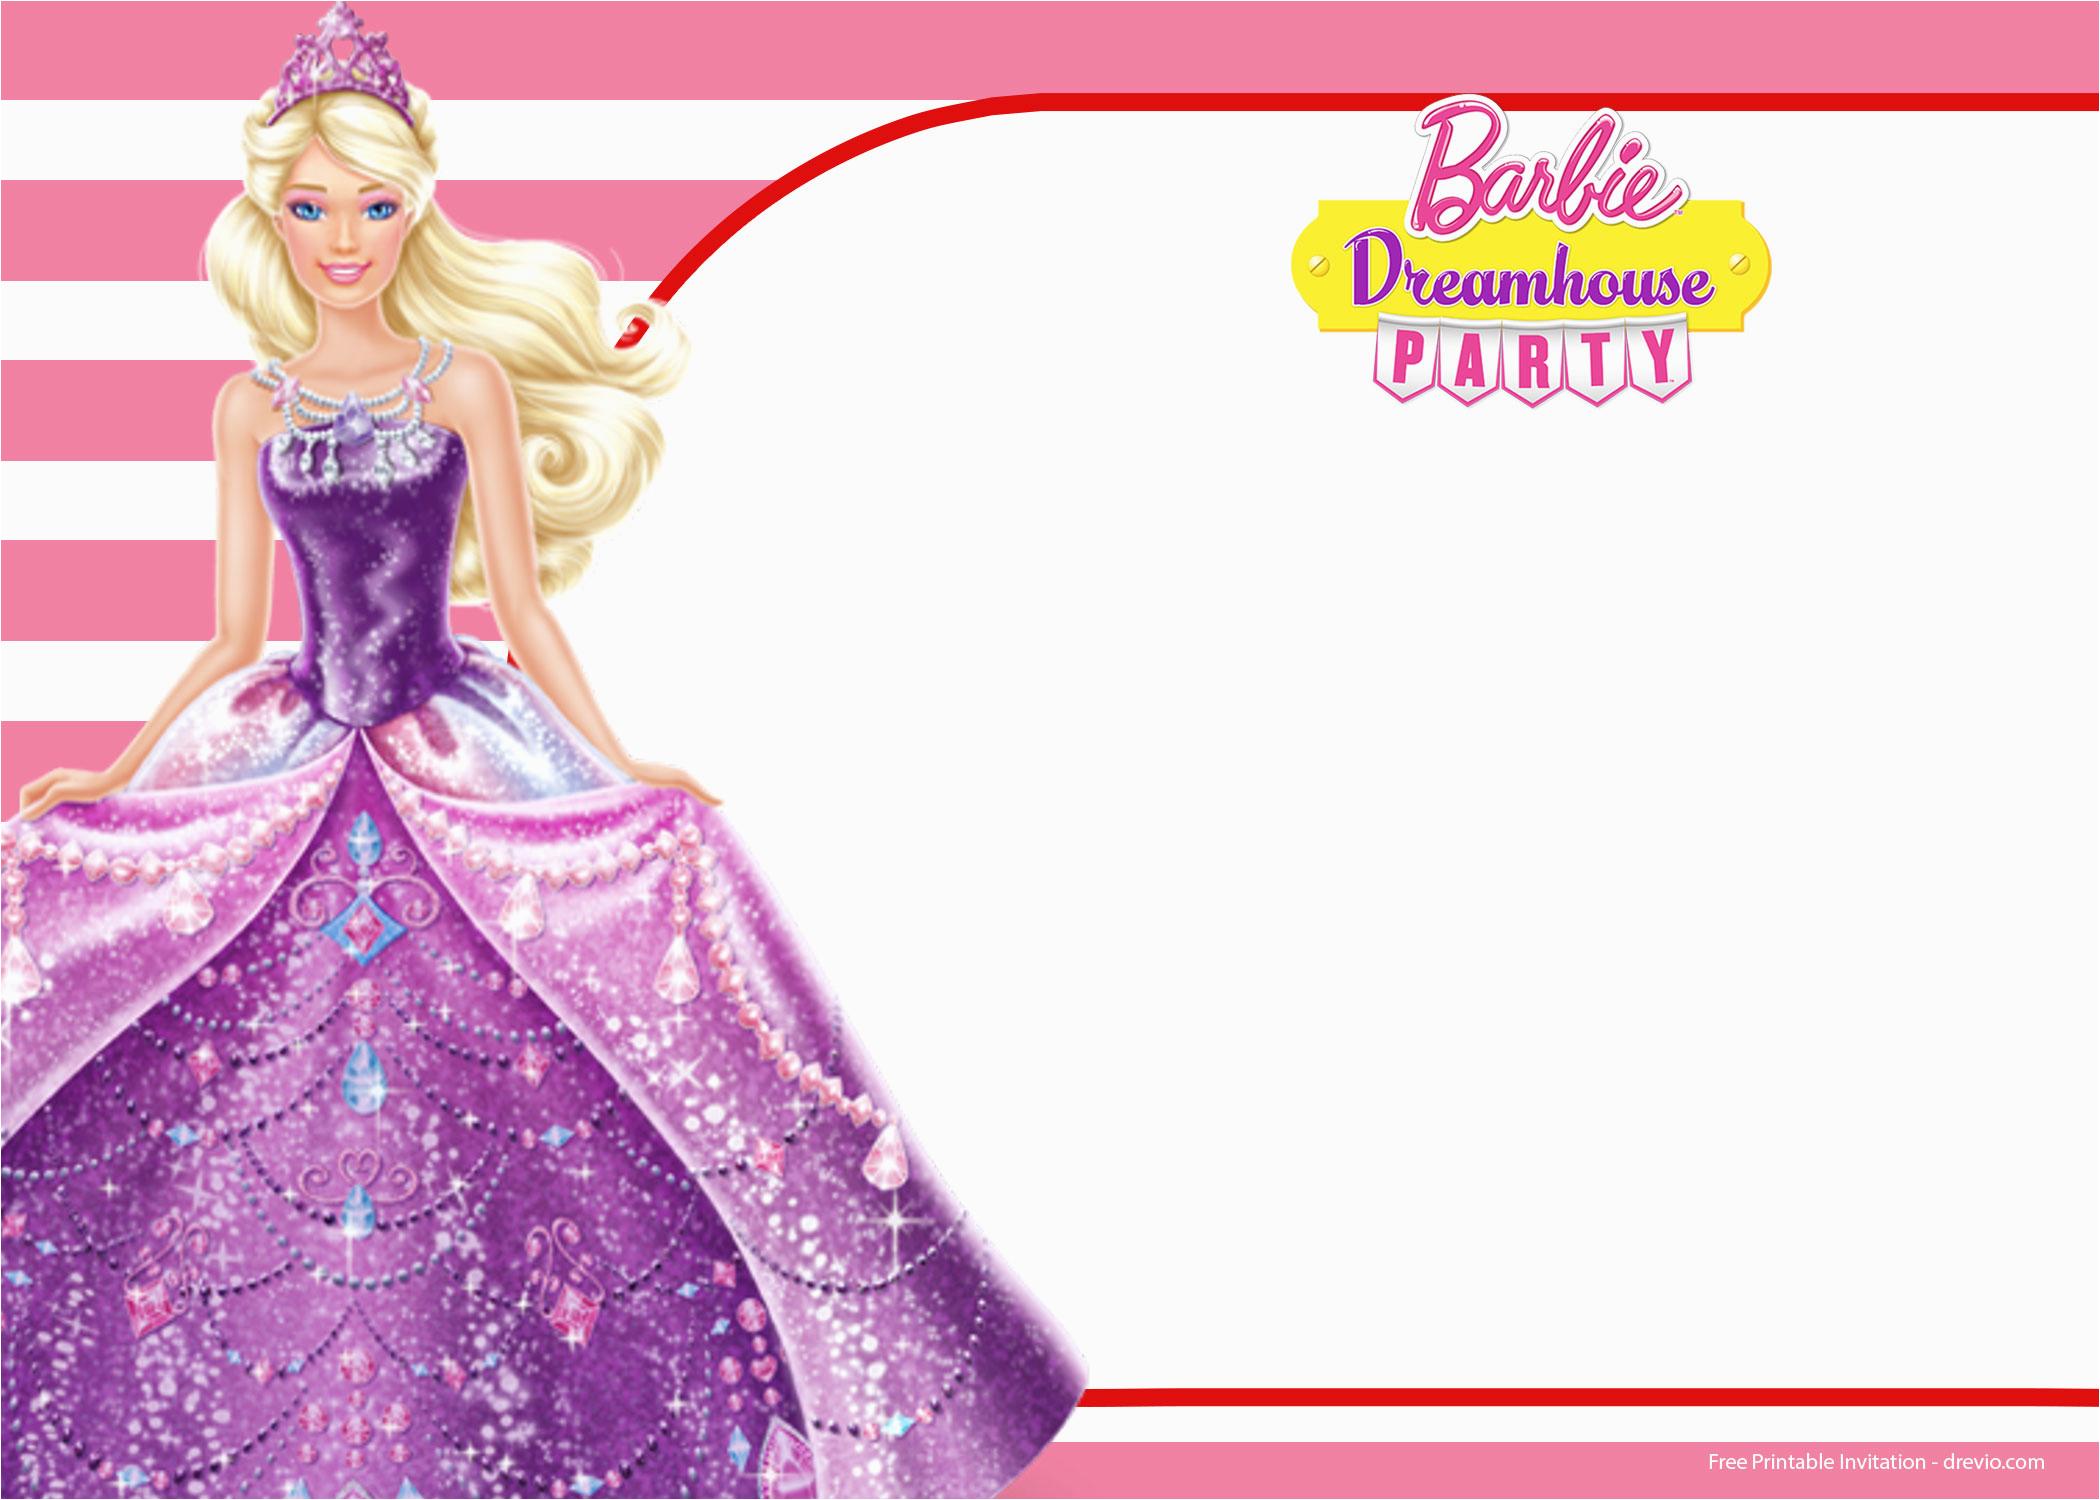 Barbie Birthday Invitations Templates Free | Birthdaybuzz - Free Printable Barbie Birthday Party Invitations